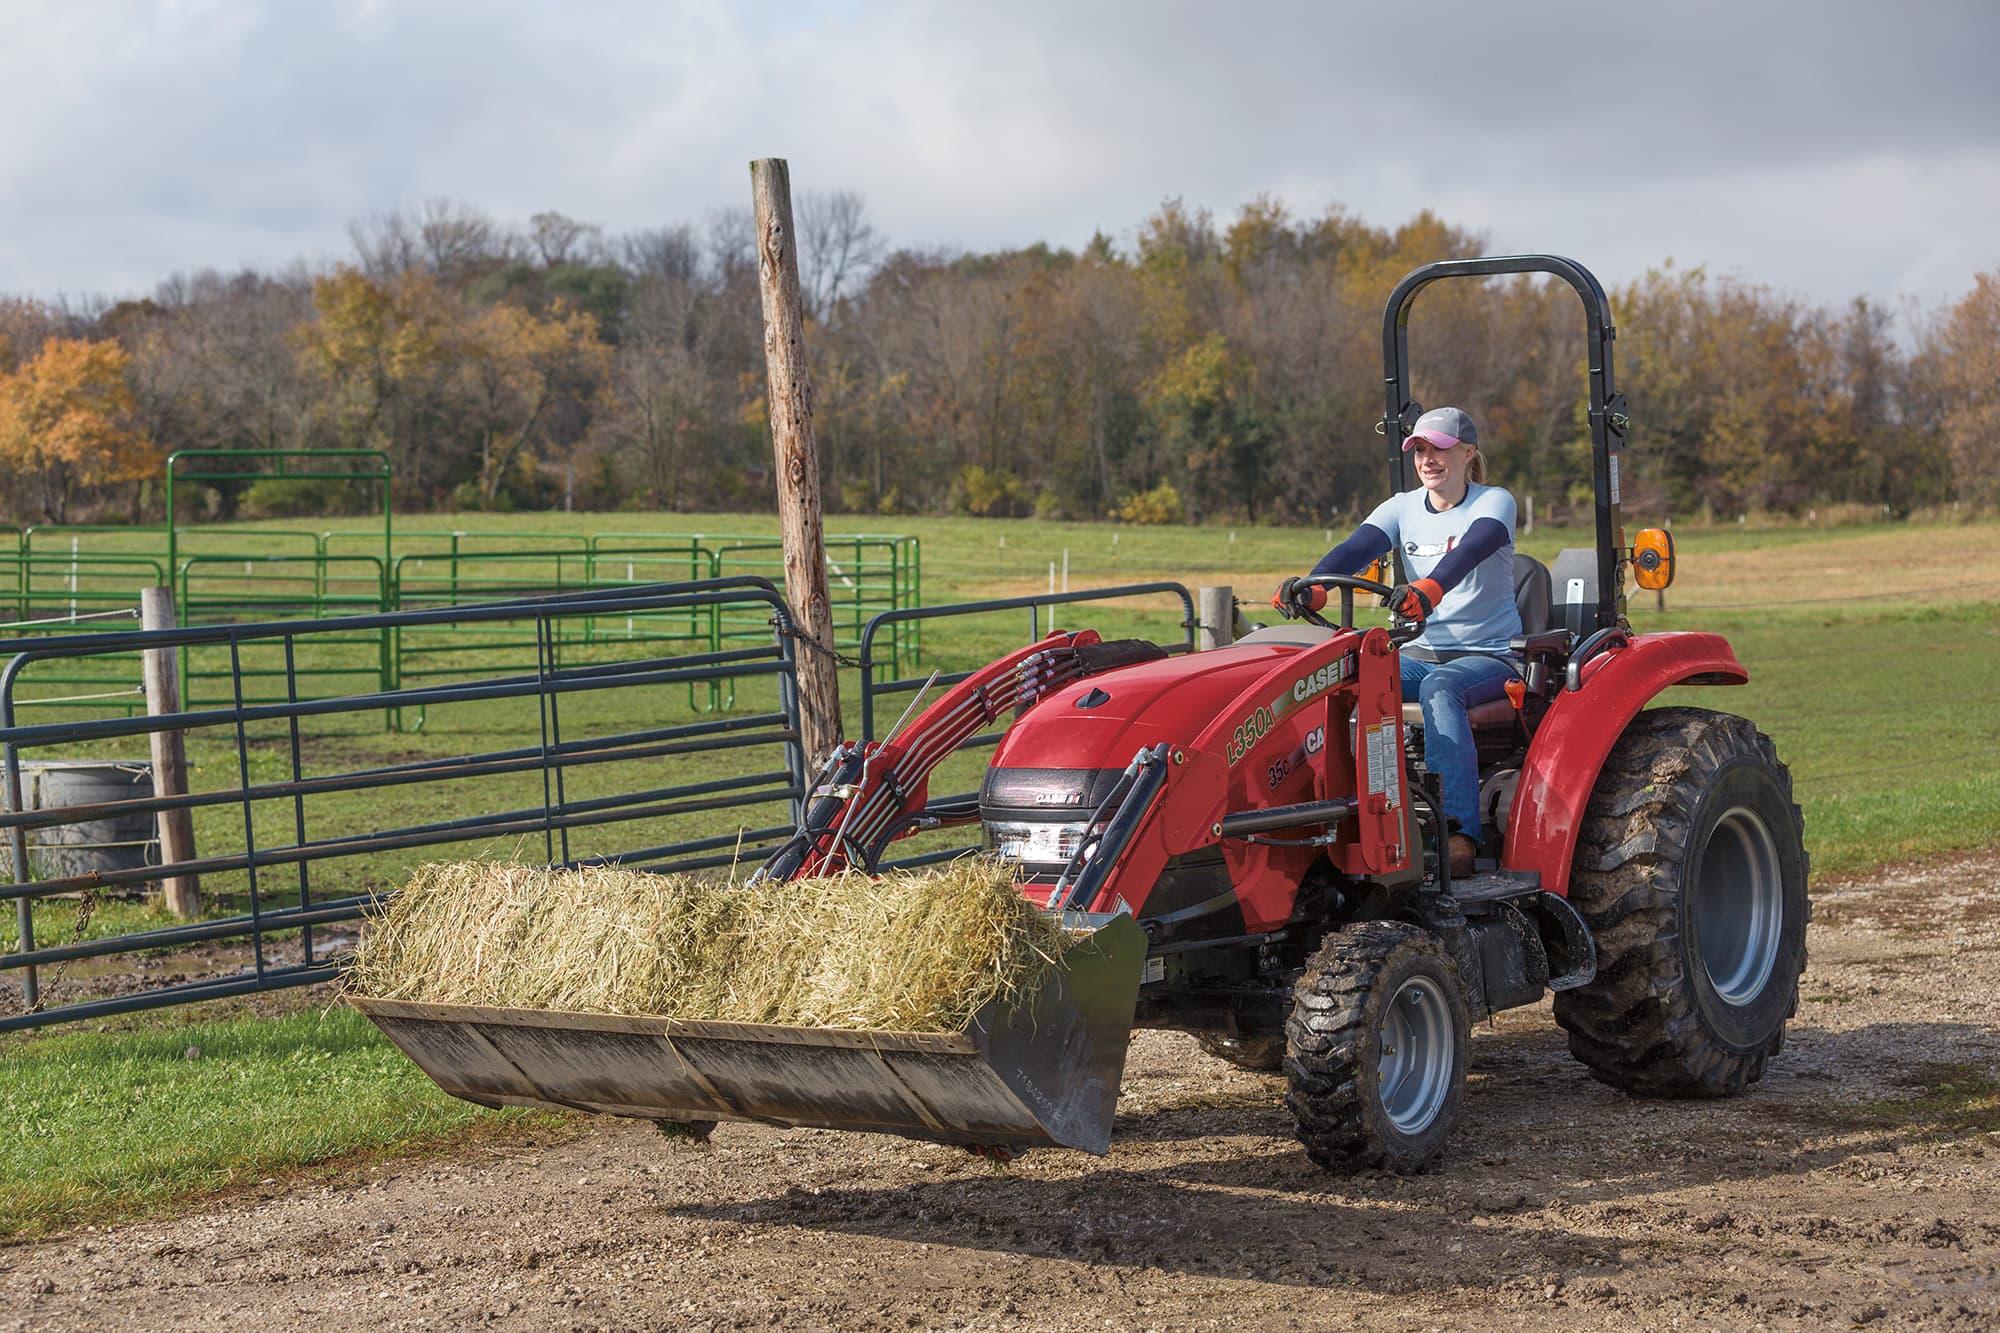 Compact Farmall 35C | Compact Utility Tractors | Case IH